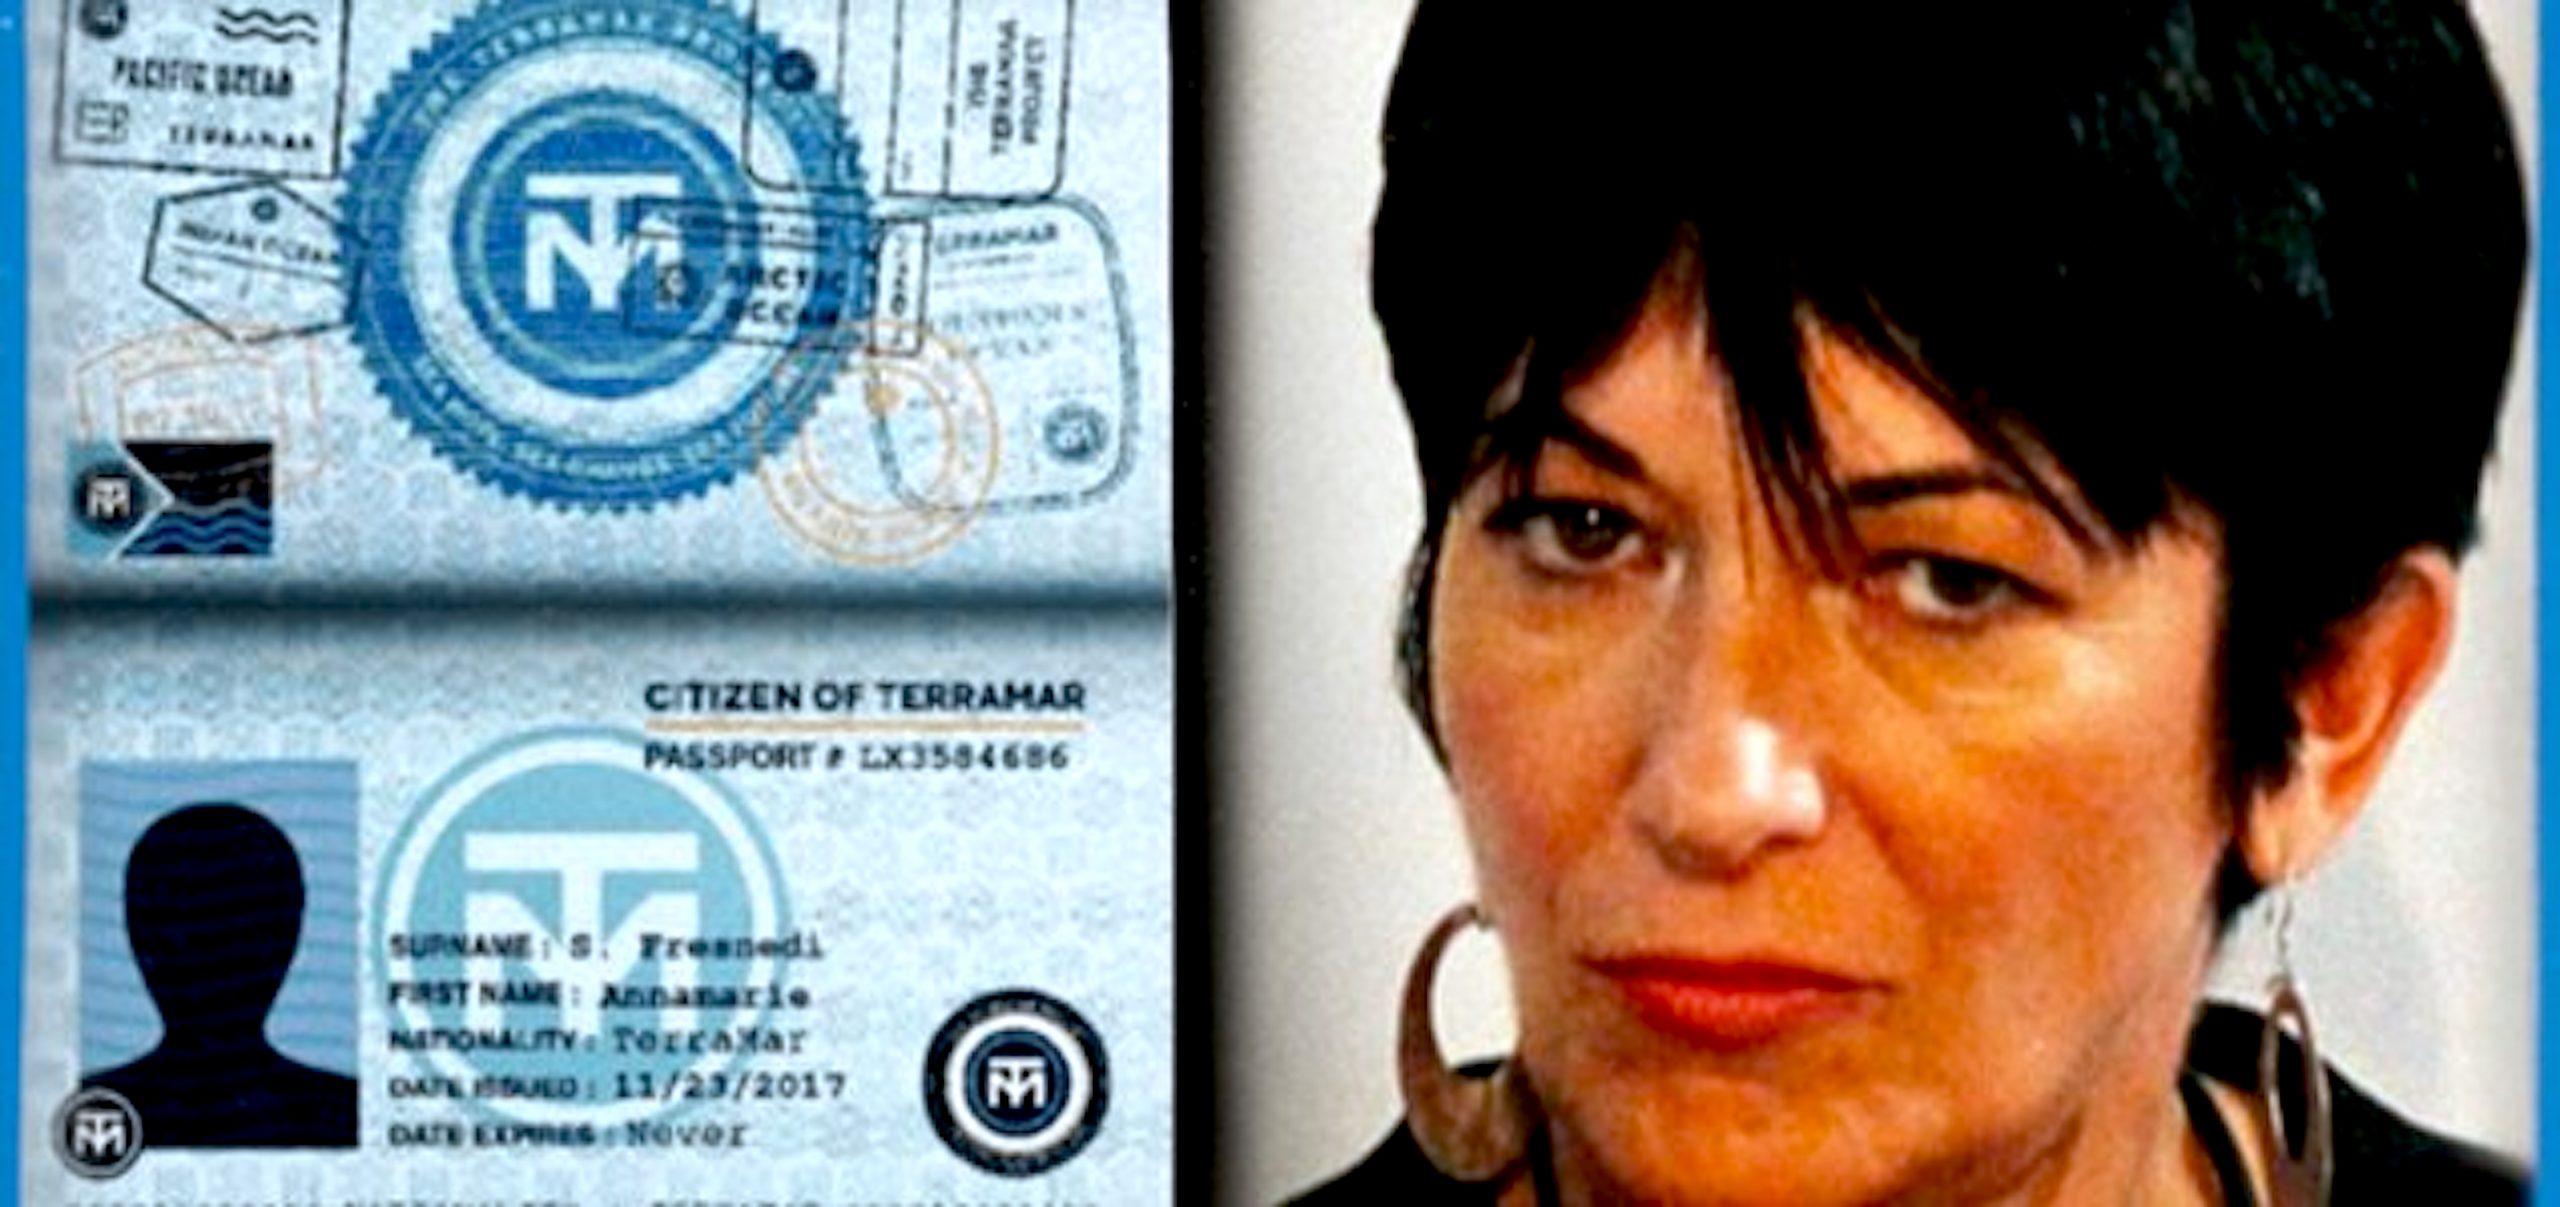 Ghislaine Maxwell with TERRAMAR PROJECT passport (foto The Duran)